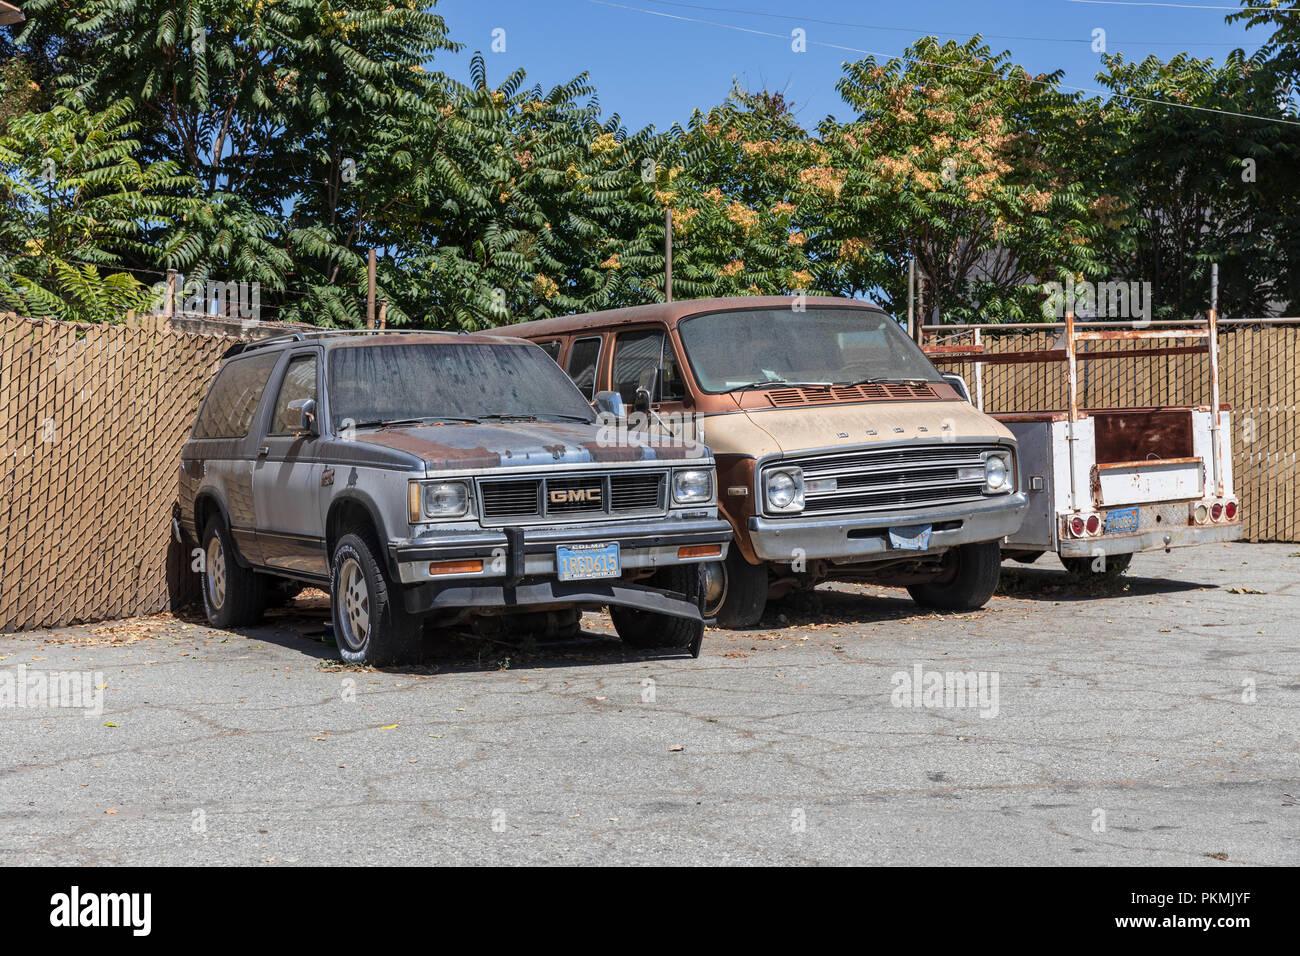 Old Cars Gmc Dodge Sunnyvale California Usa Stock Photo Alamy